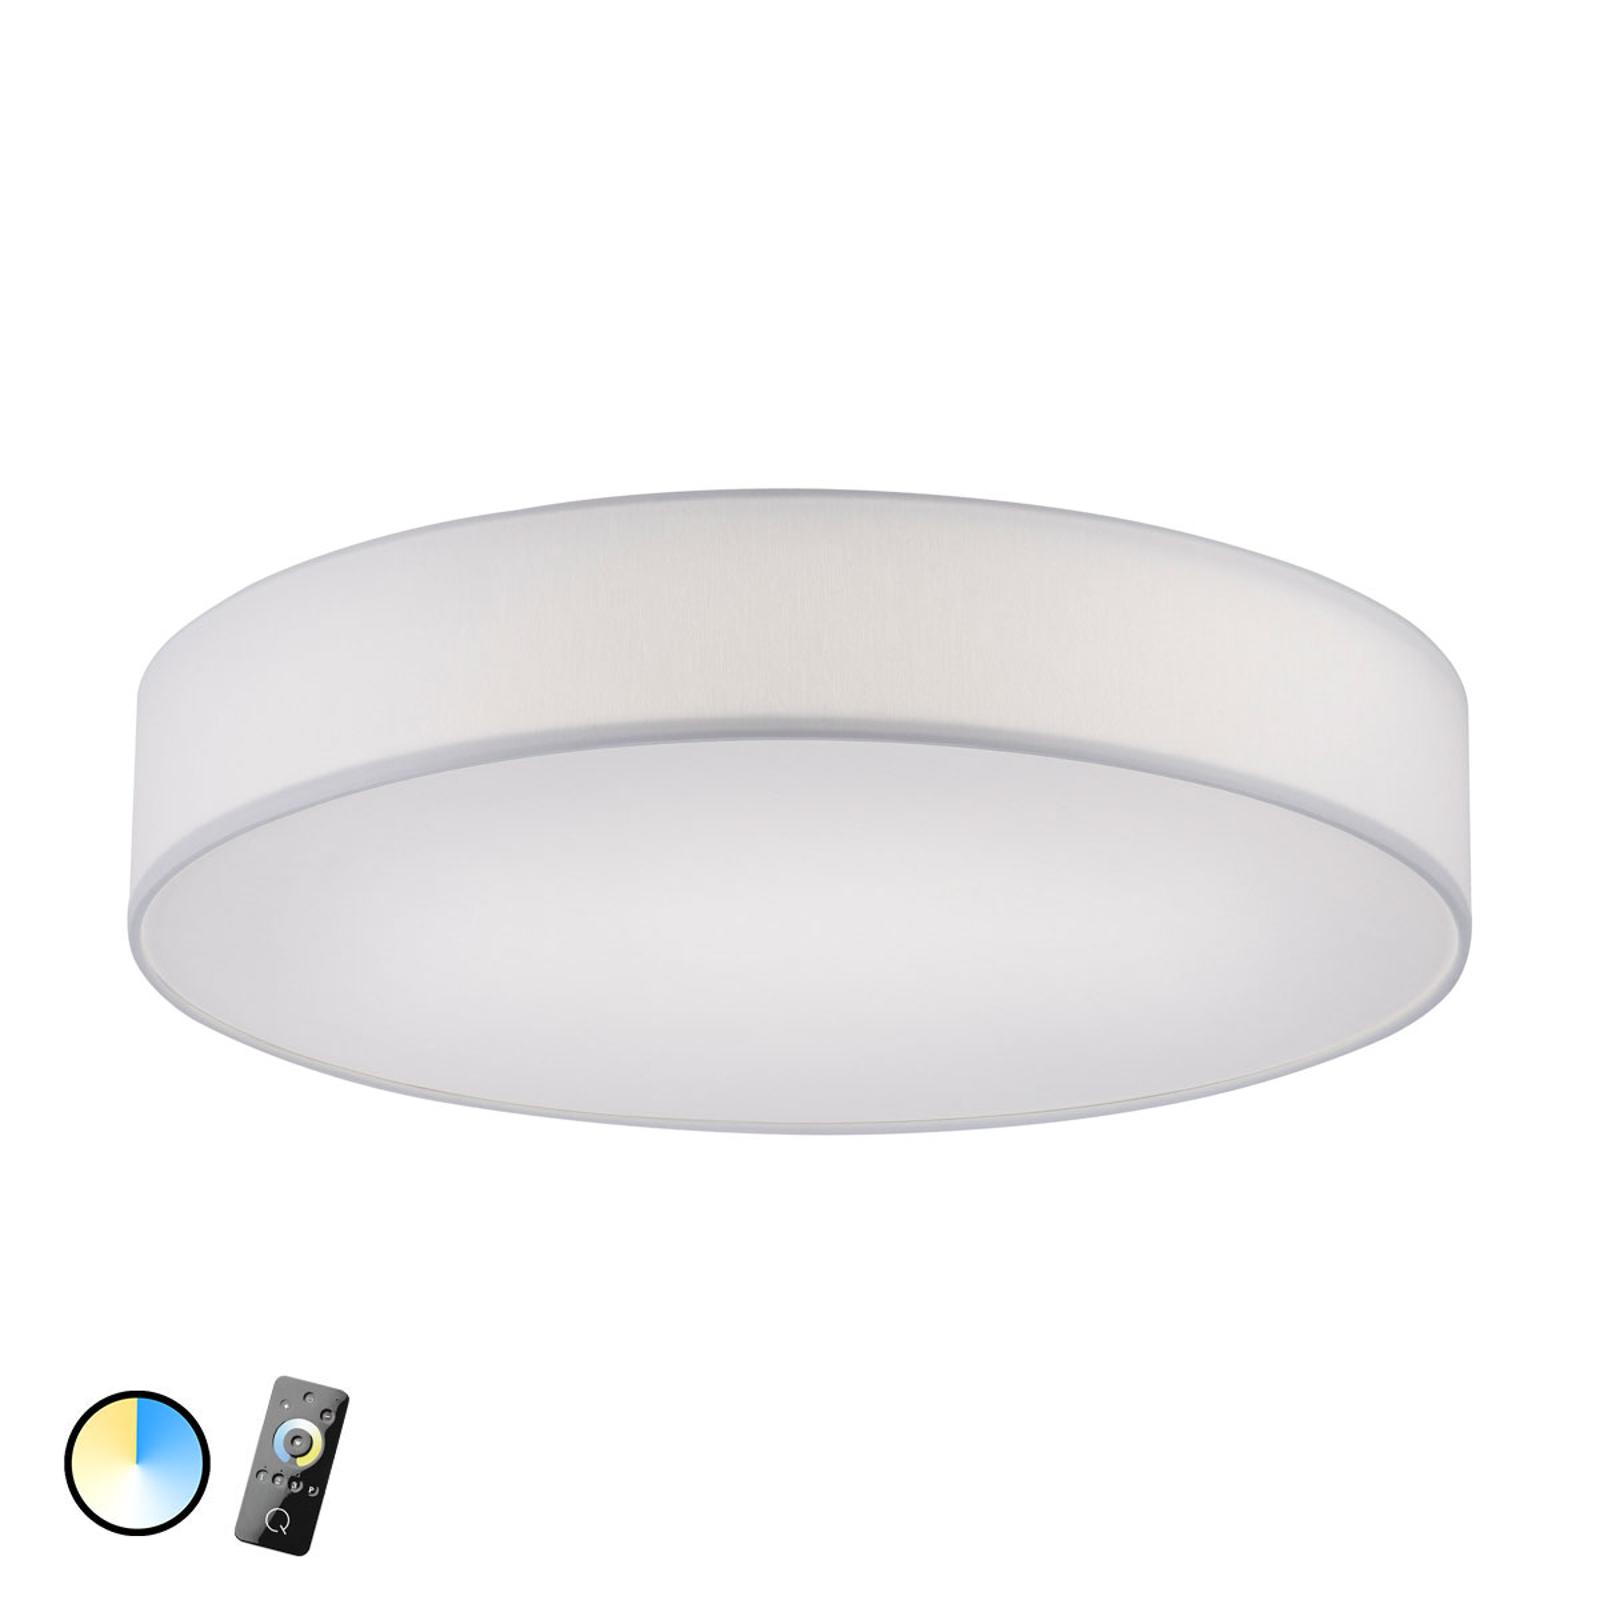 Paul Neuhaus Q-KIARA Textil-Deckenlampe Smart Home kaufen